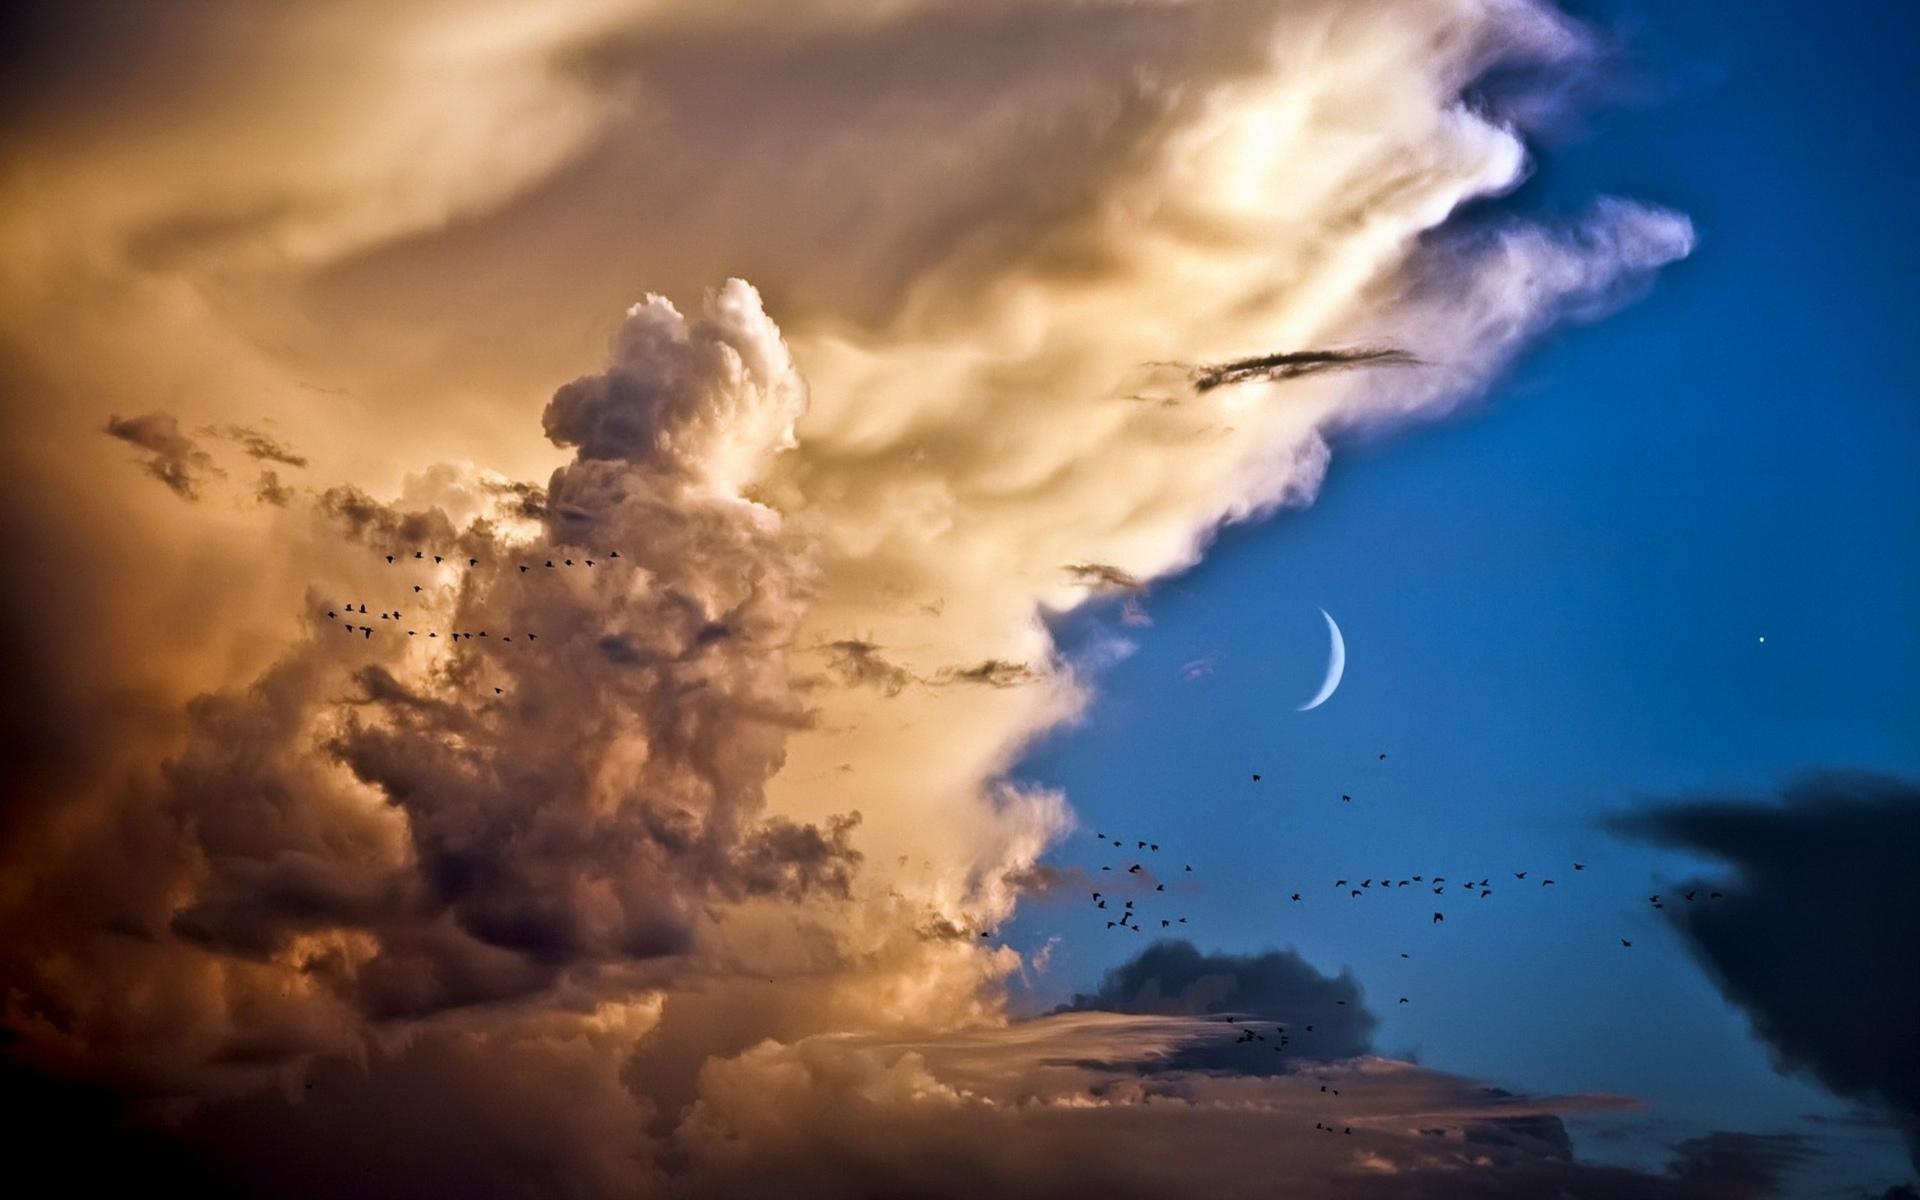 thunderhead clouds wallpaper - photo #15